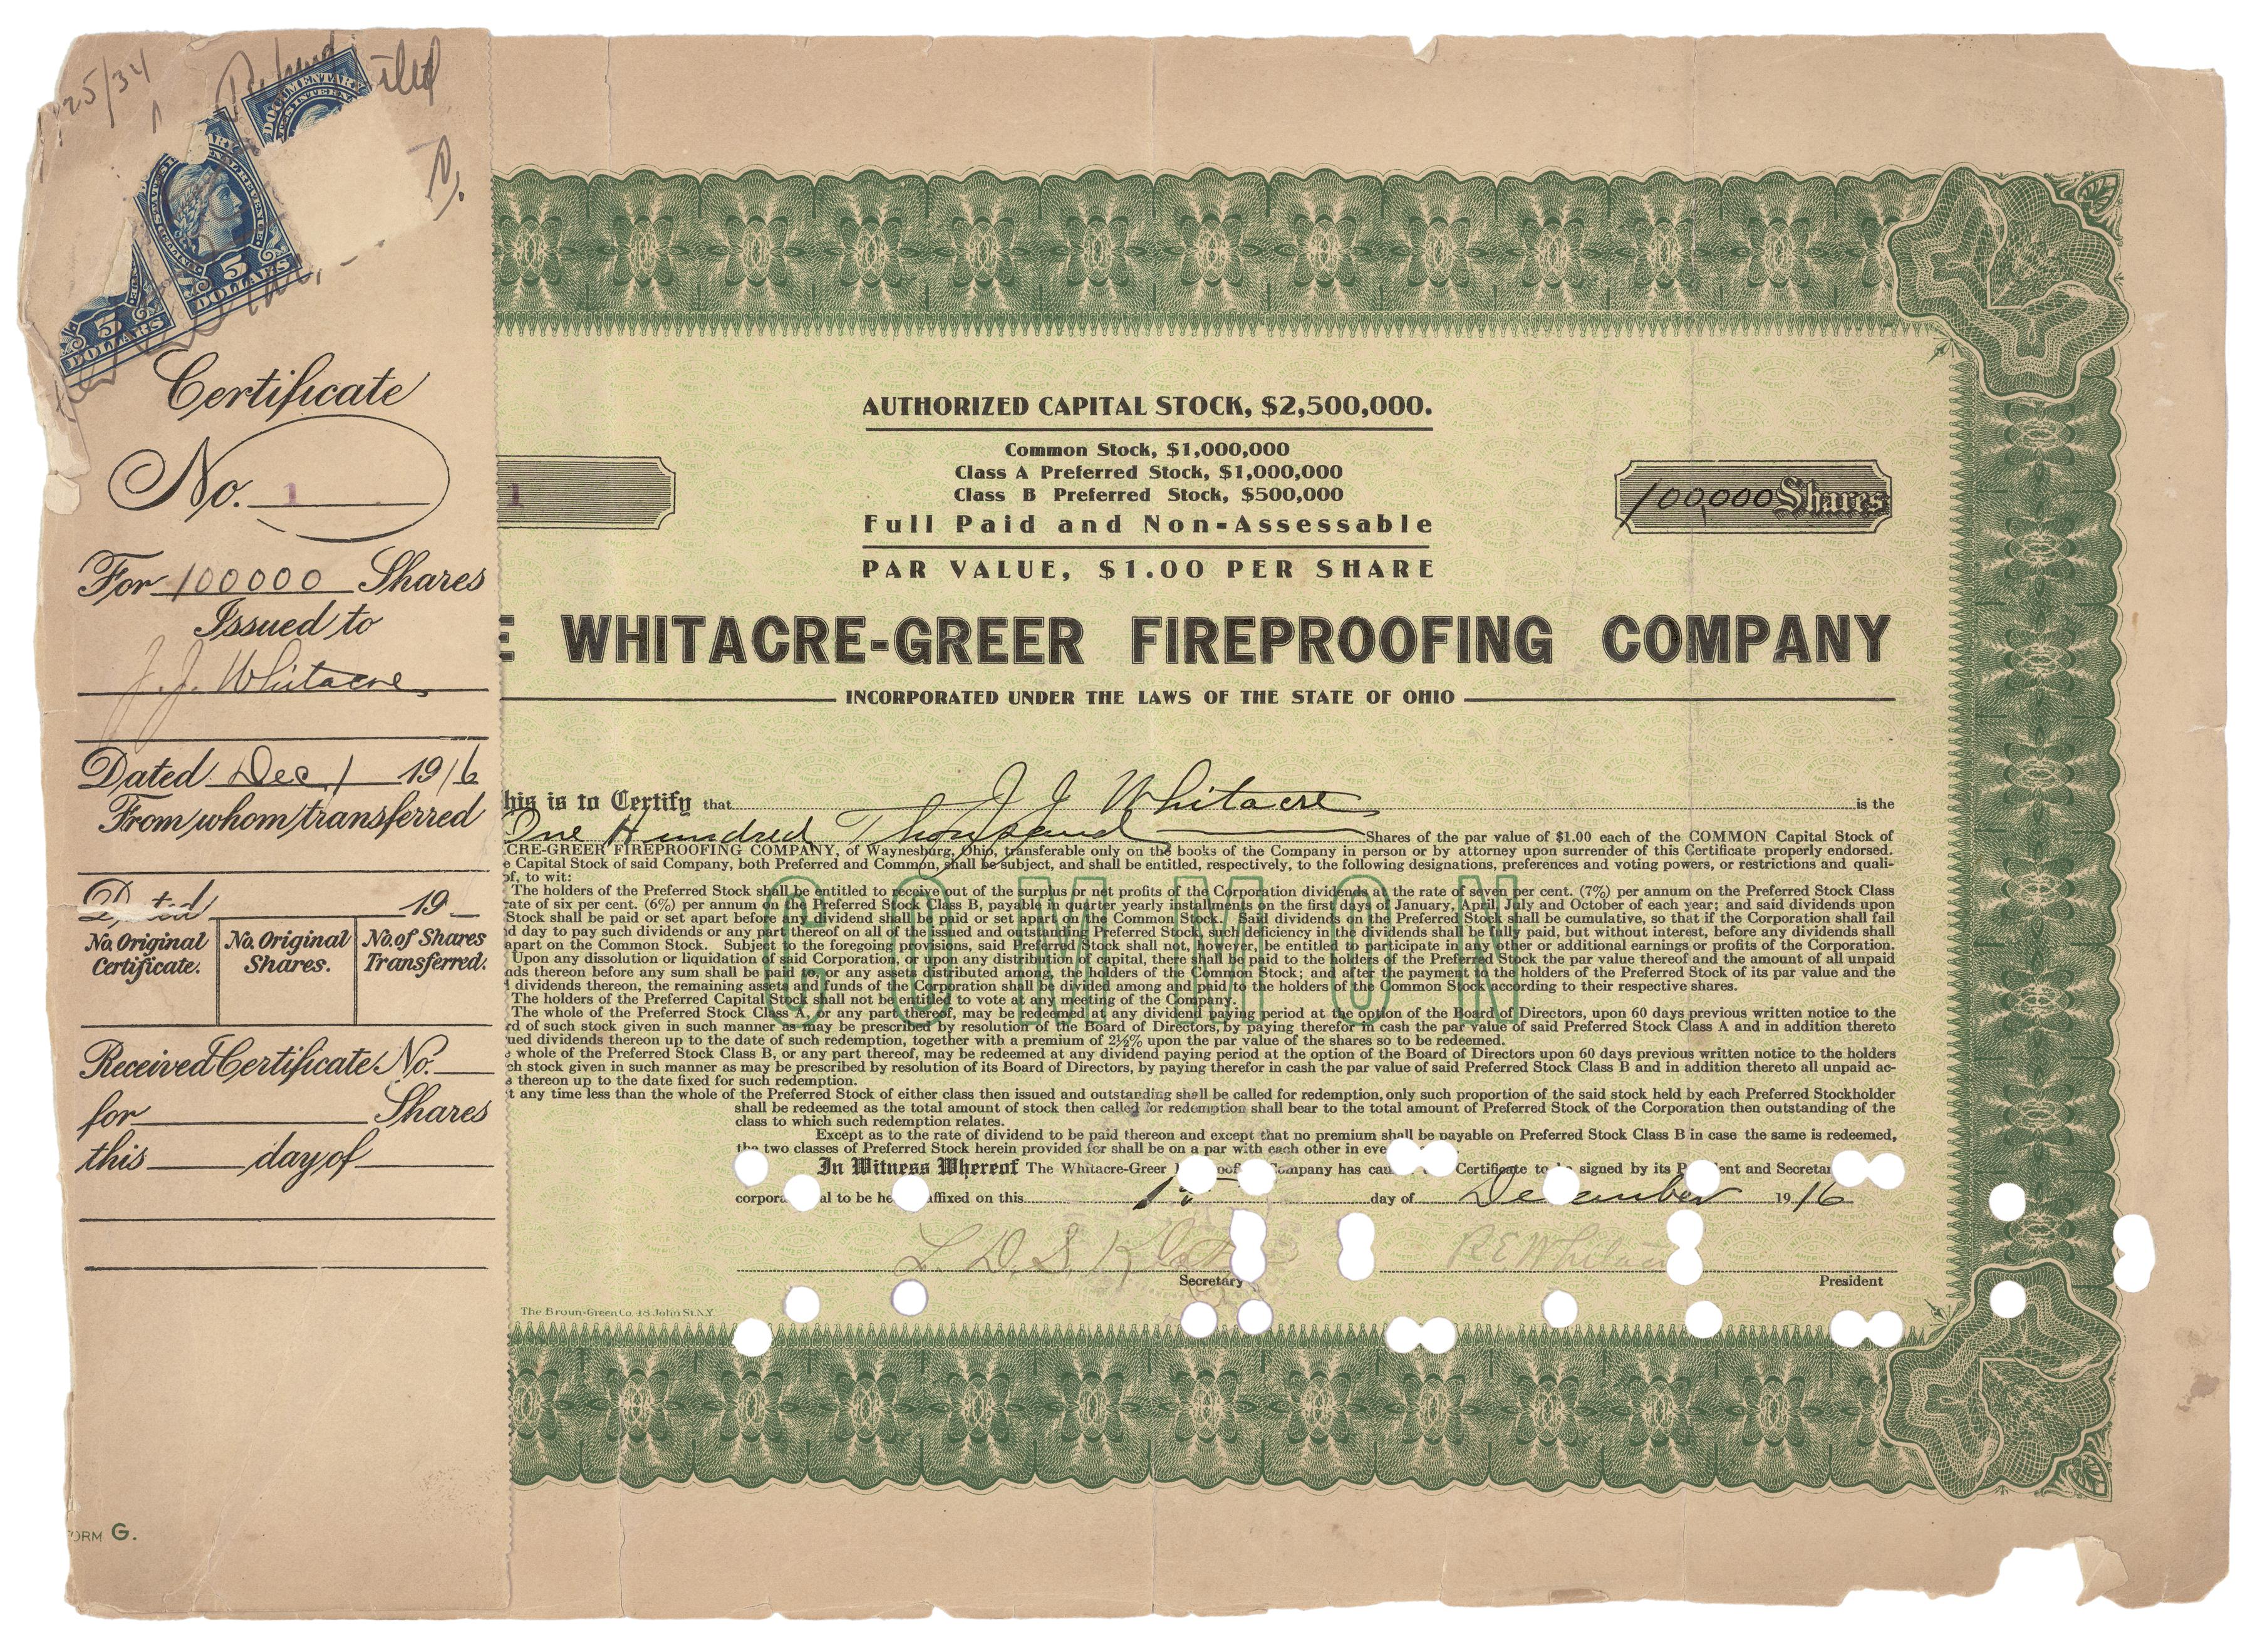 WG Stock Certificate No 1